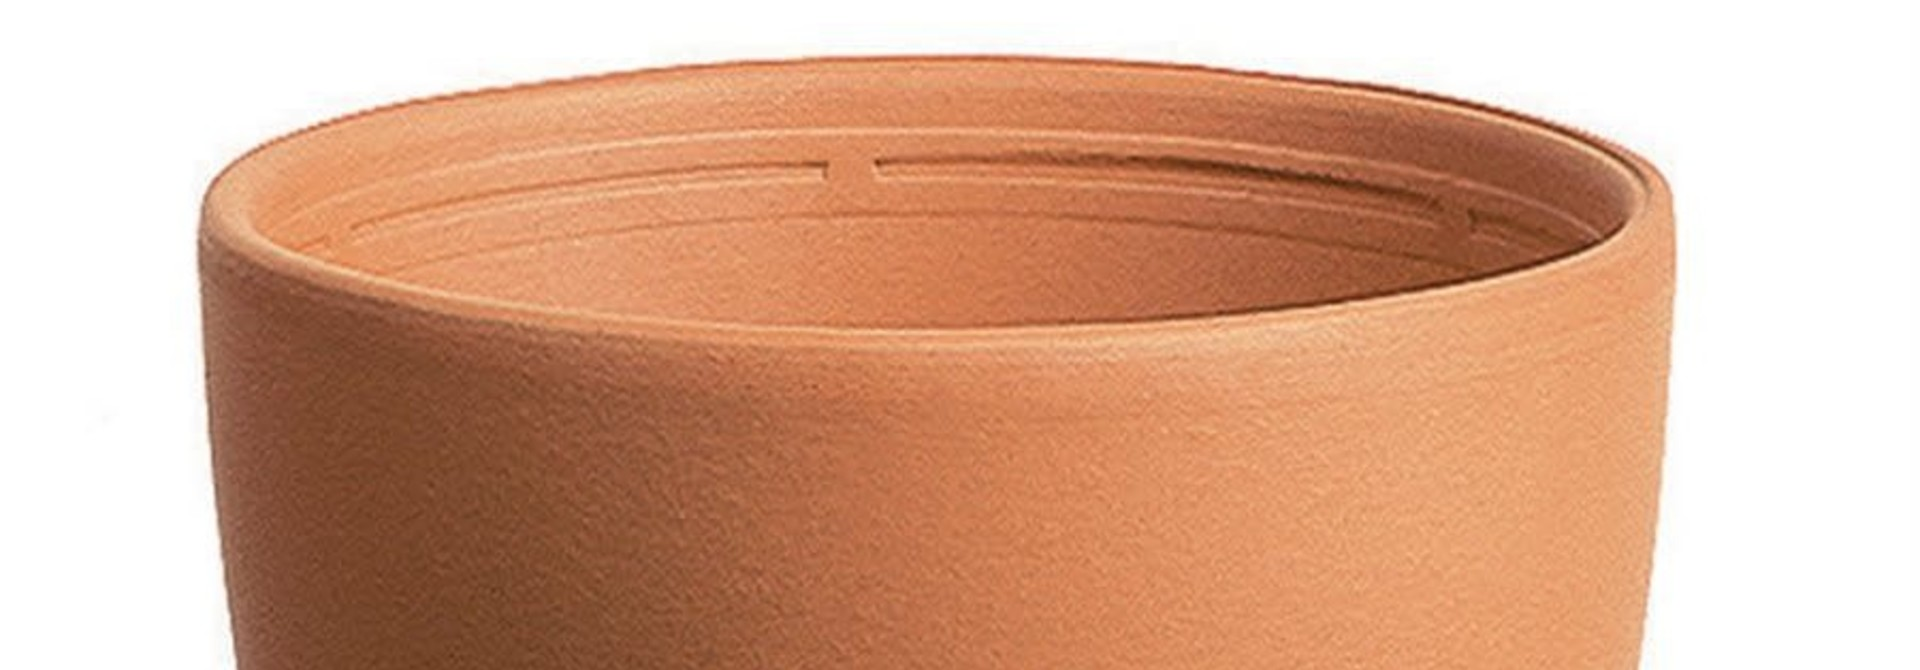 Mangiatoia terracotta 19 cm bol